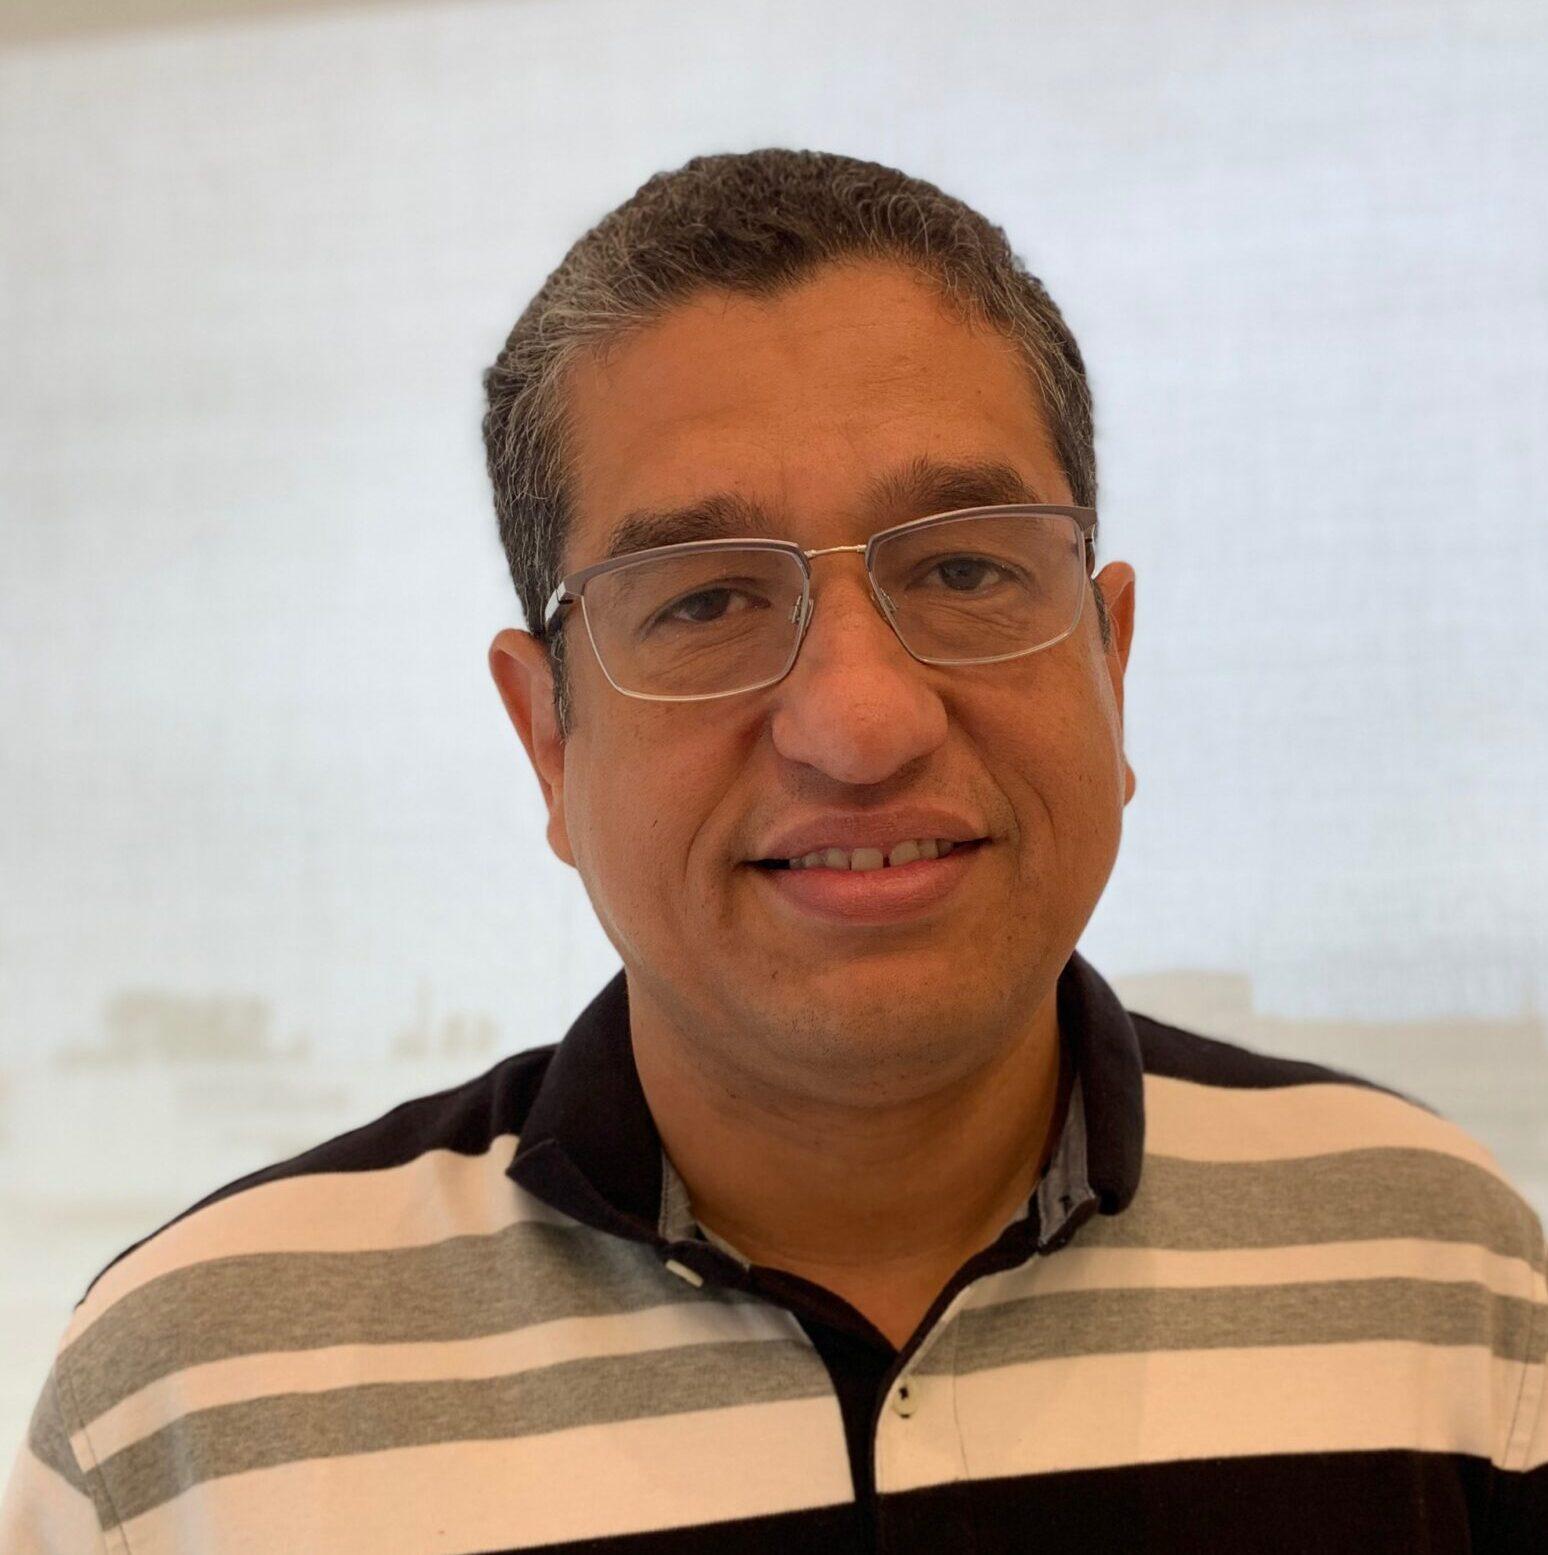 Robson Galvao